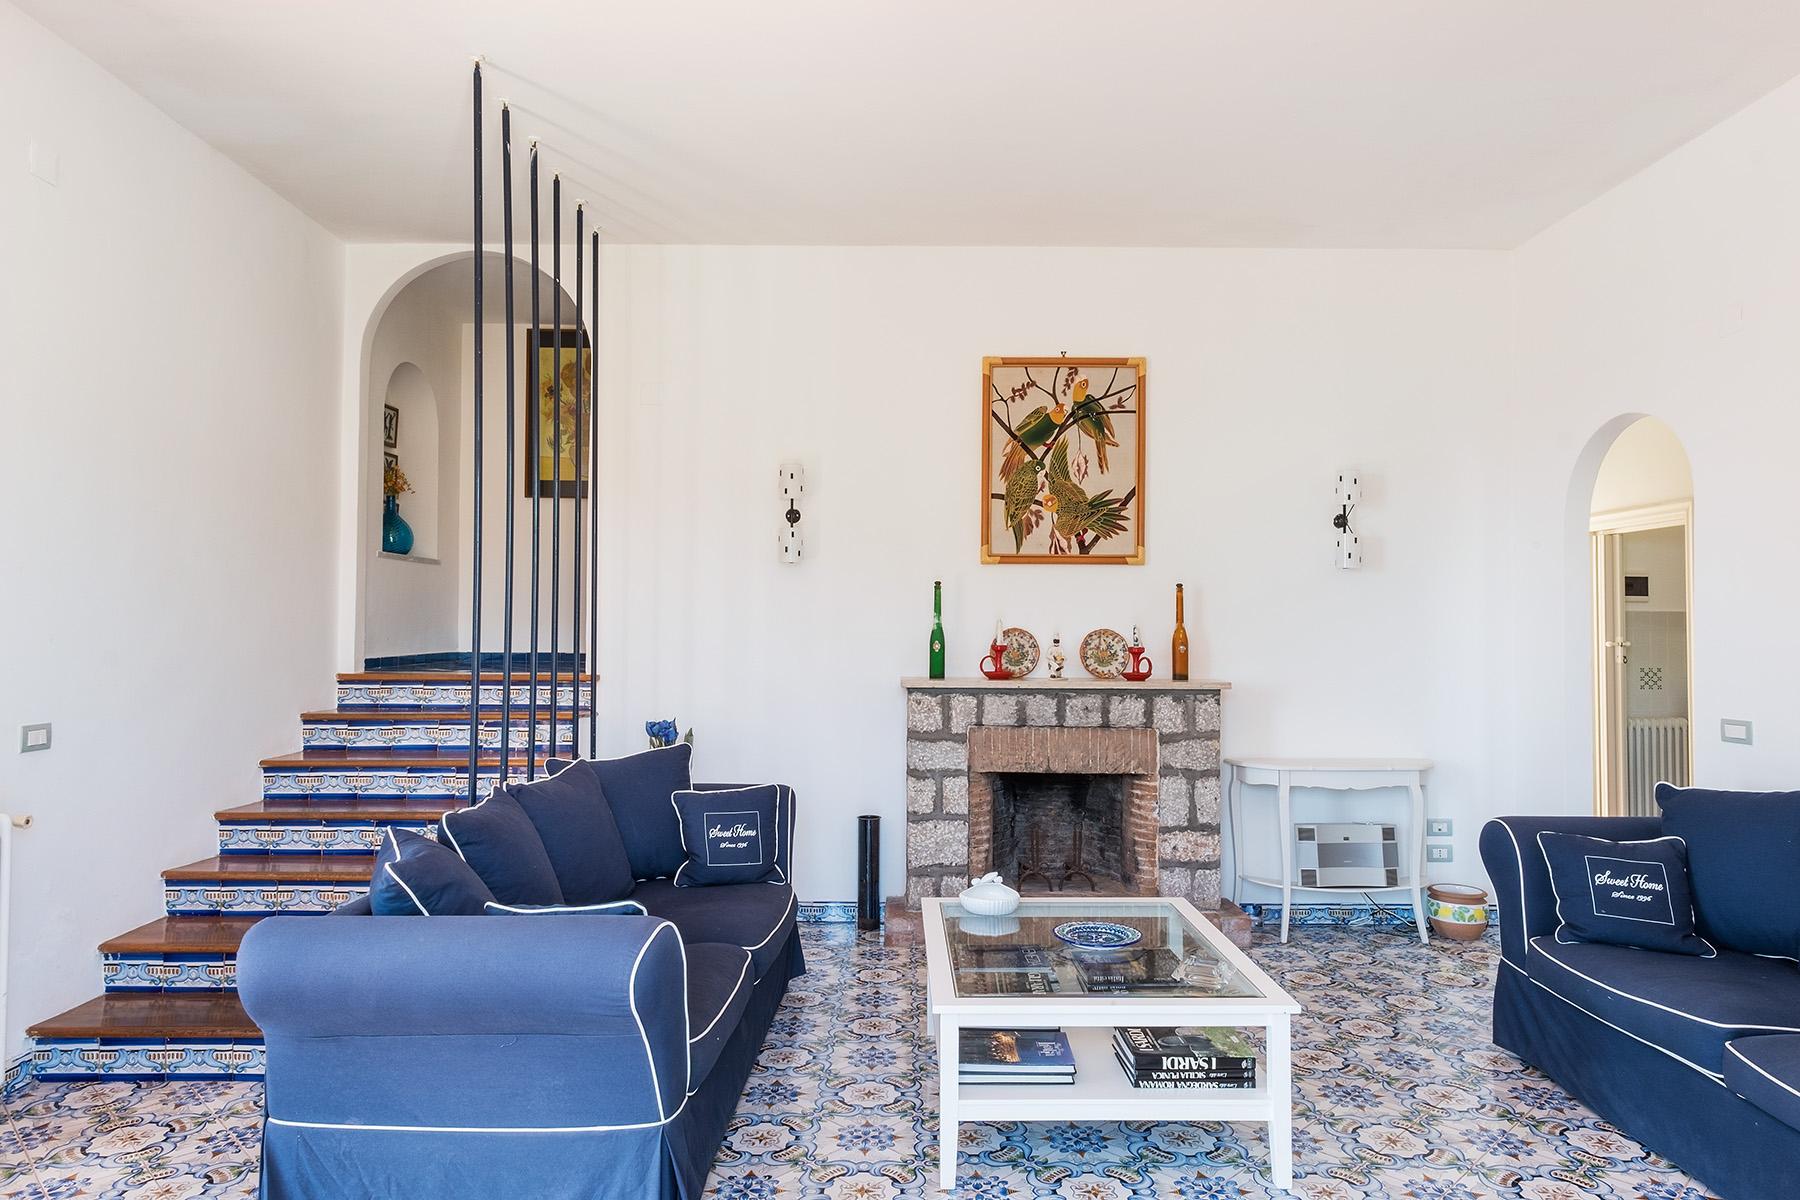 Прекрасная вилла с панорамным видом на море в центре легендарного острова Капри, Италия - 9